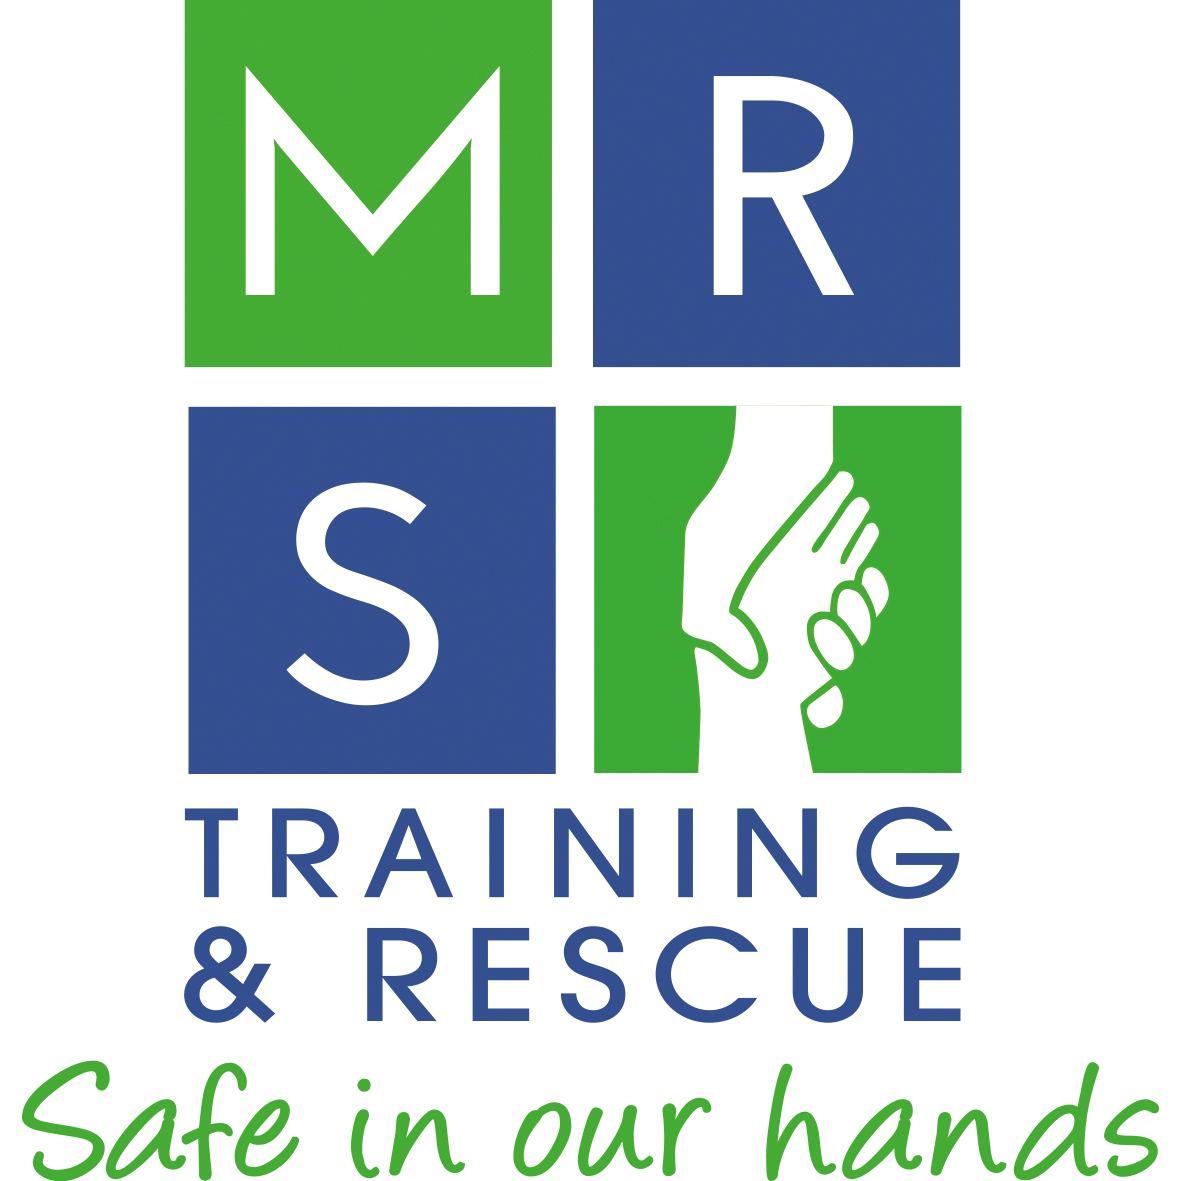 M R S TRAINING & RESCUE Logo